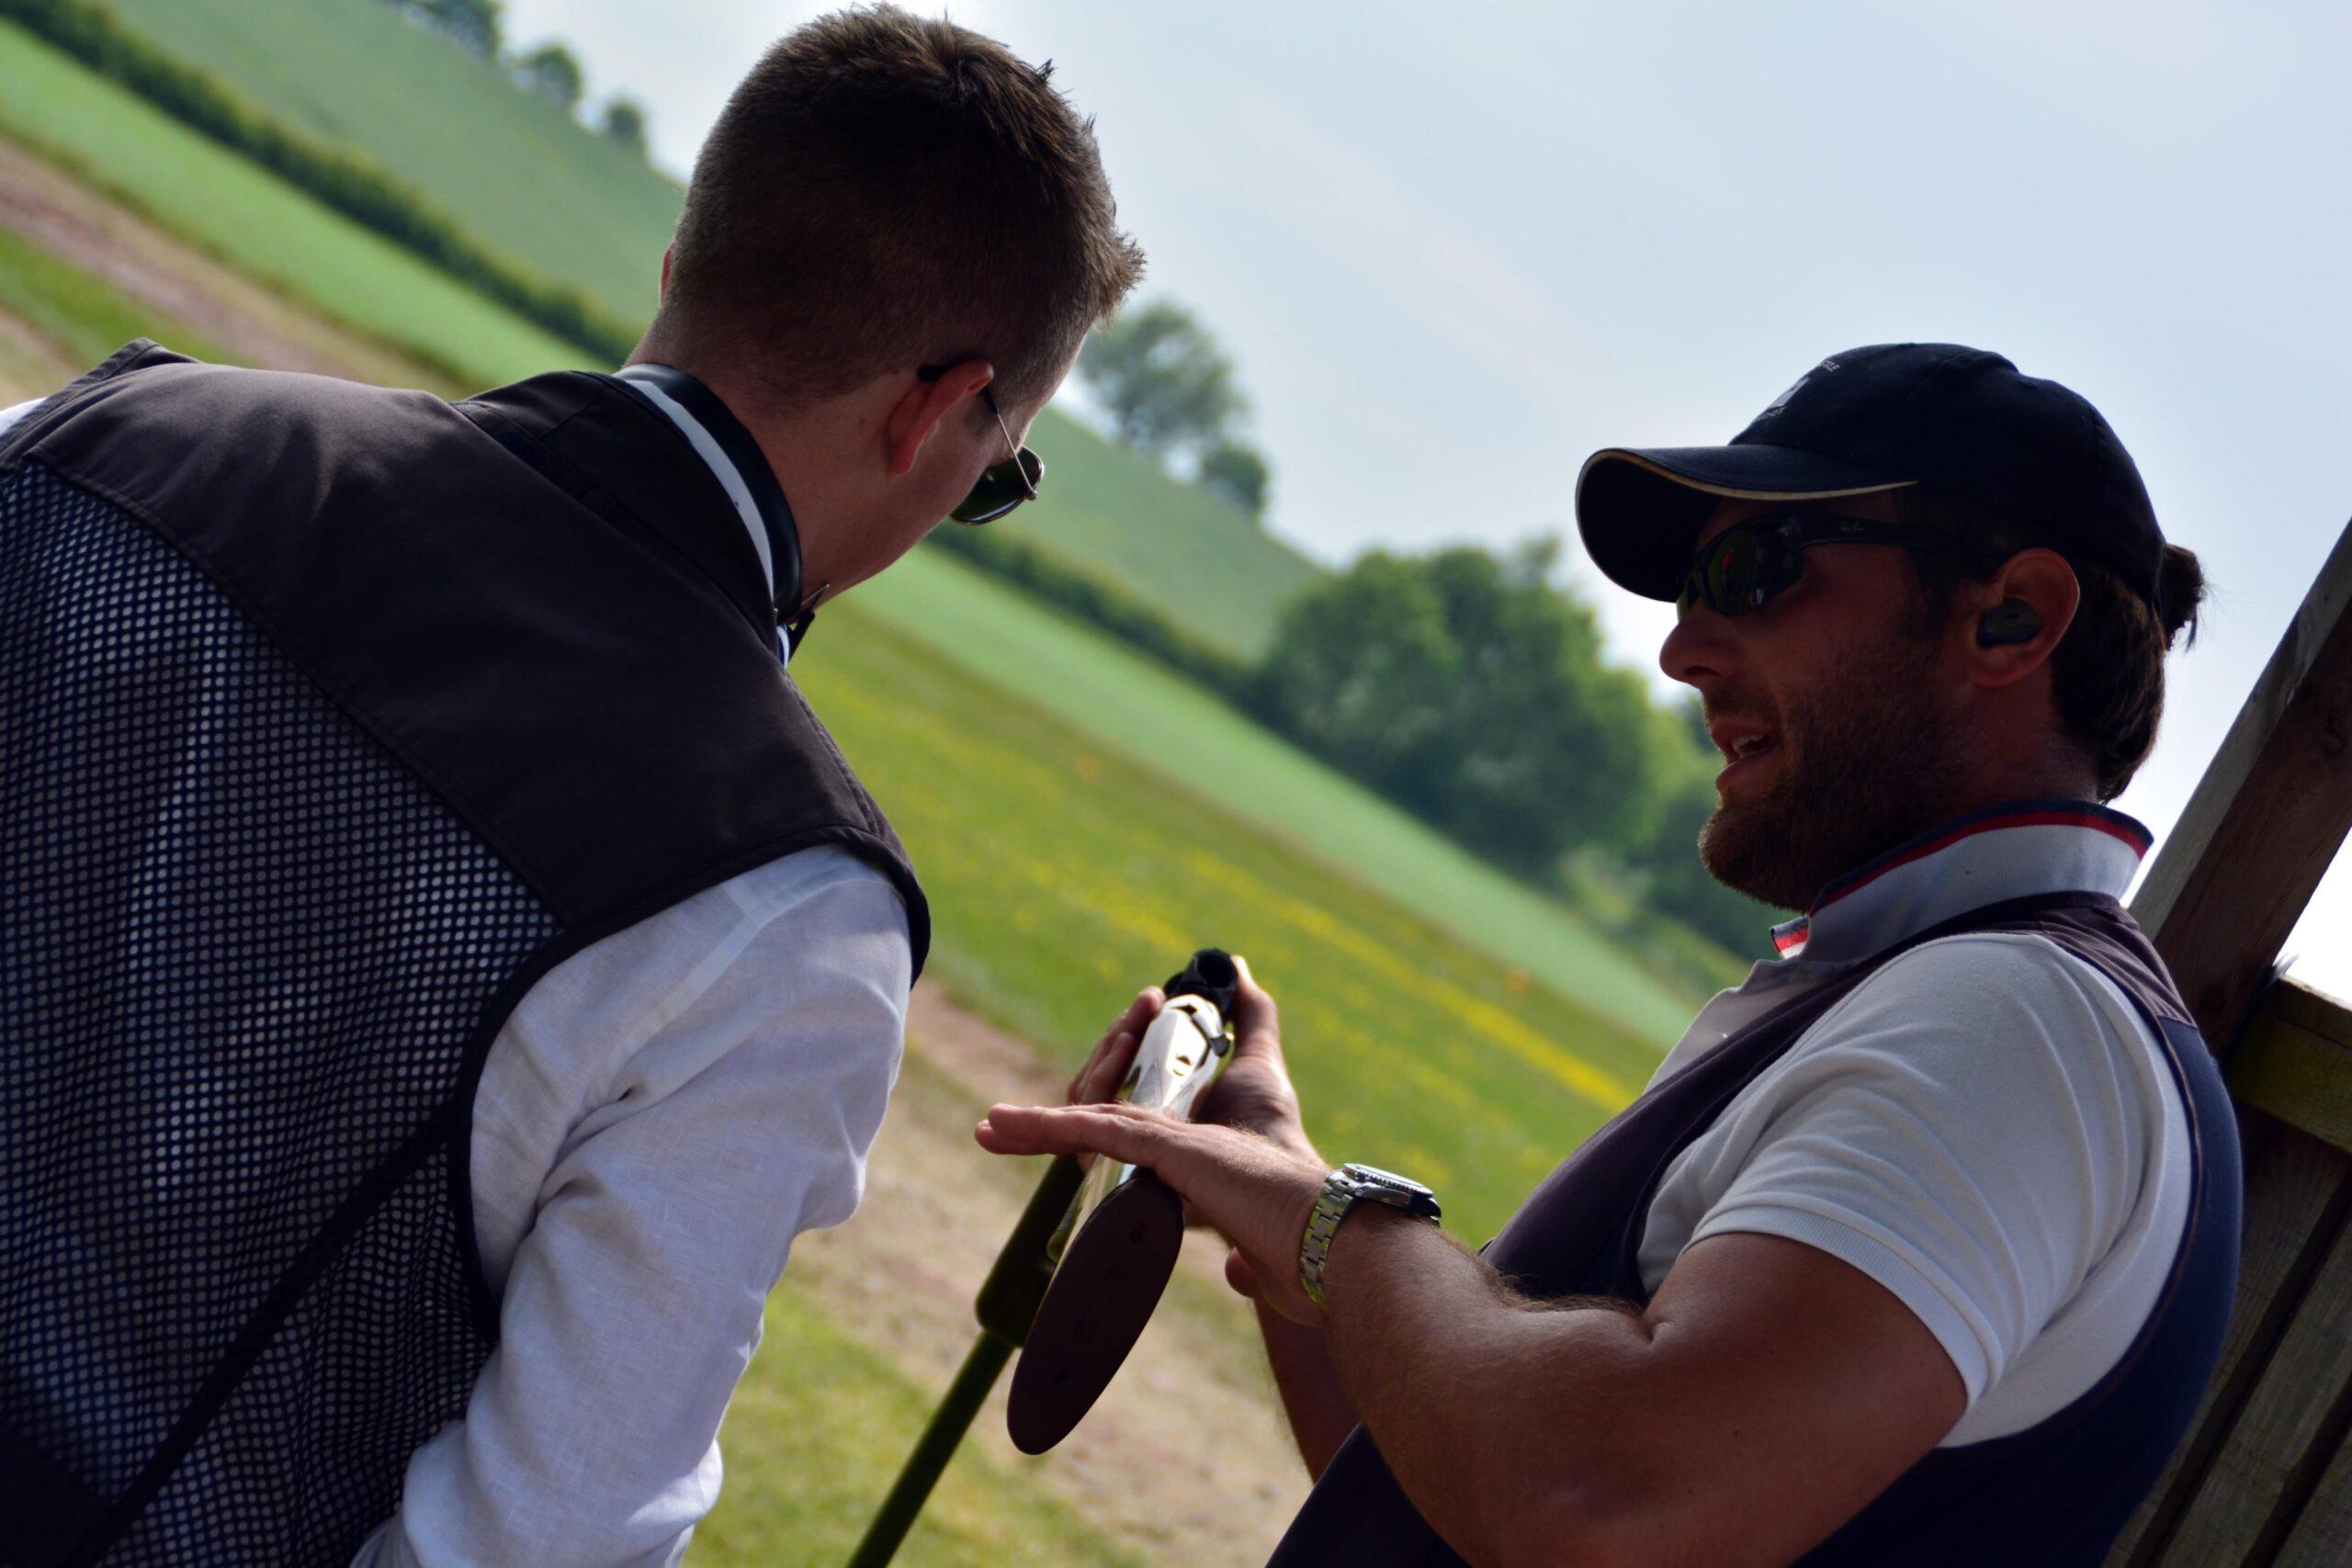 UK Sport coach apprenticeship